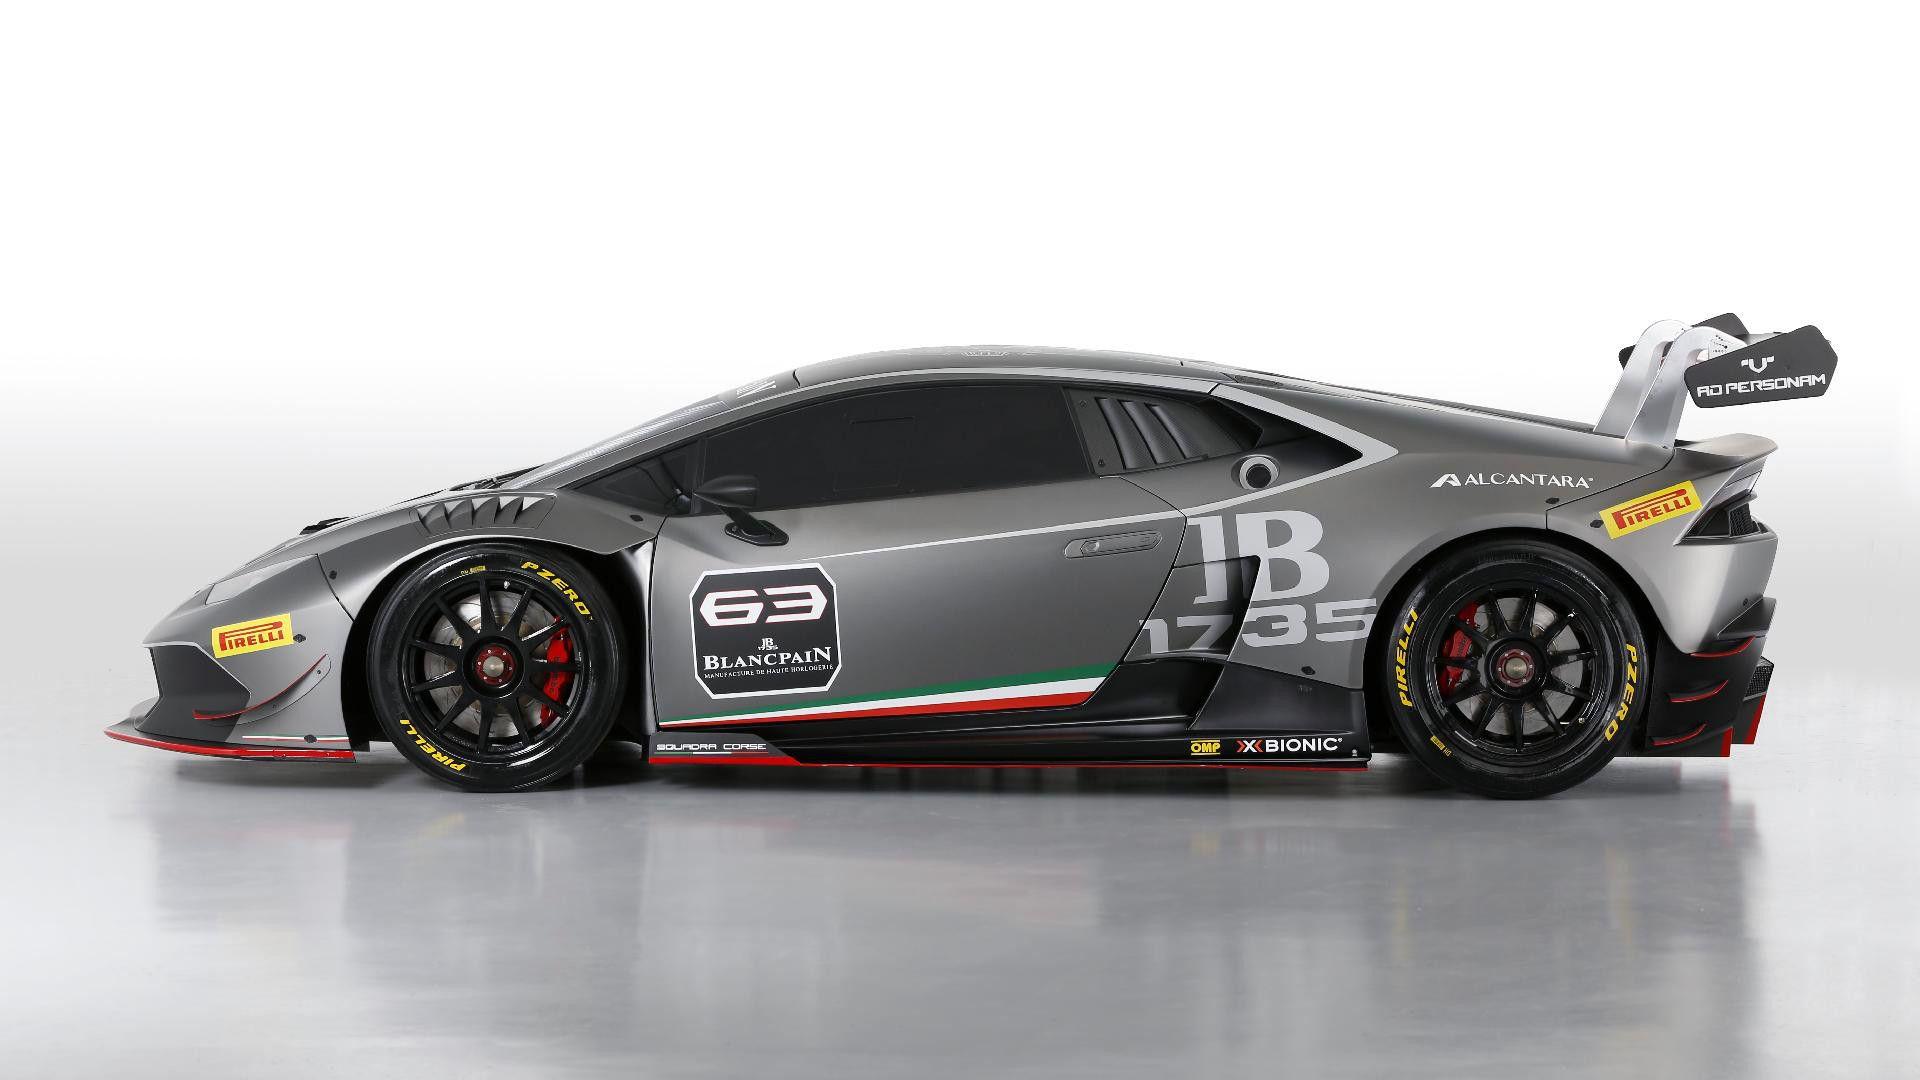 d23a0185fe6519179501e852396de160 Gorgeous Lamborghini Huracan Lp620-2 Super Trofeo top Speed Cars Trend